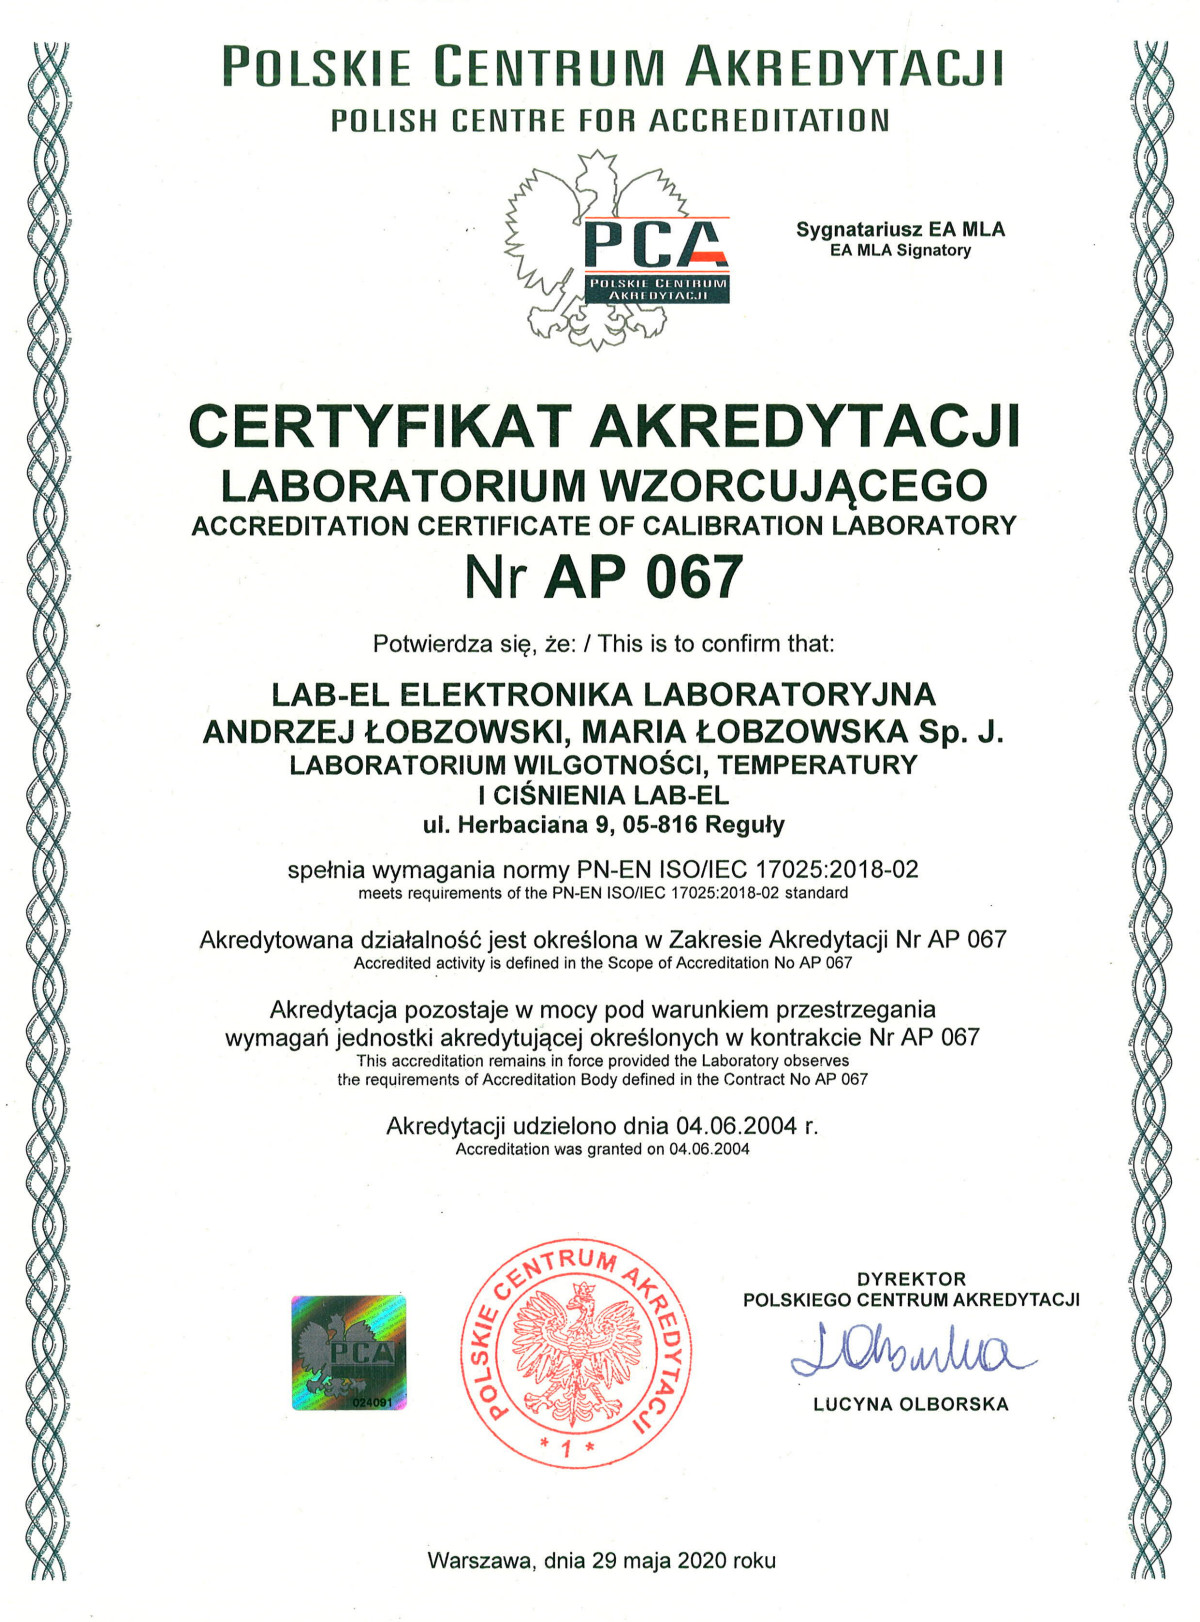 Certyfikat akredytacji PCA nr AP 067